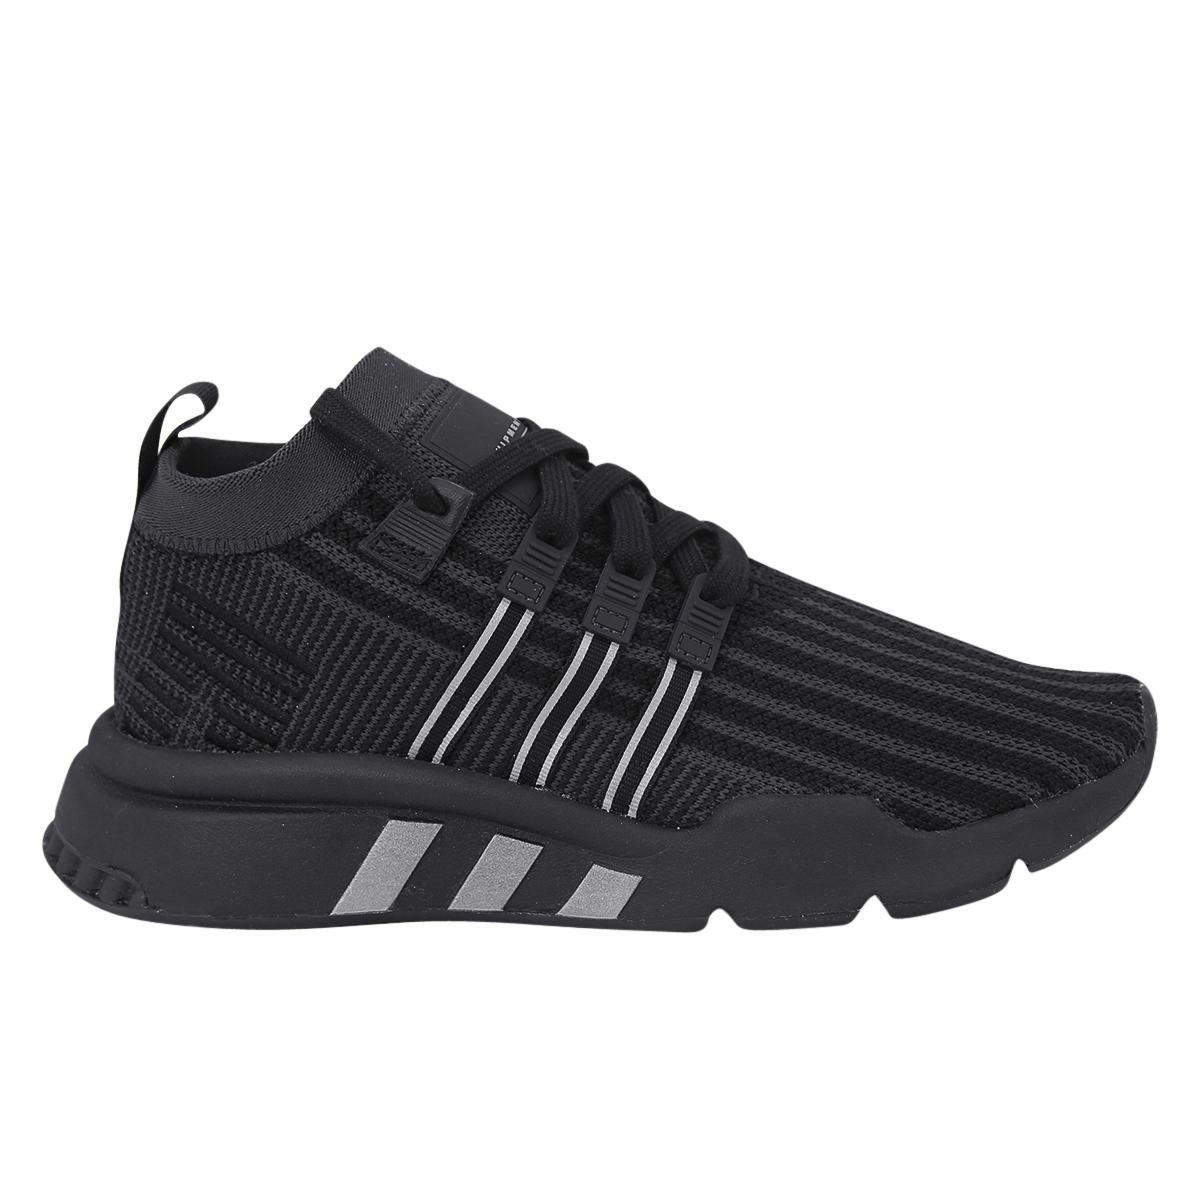 Adidas Adv Herren Support Schuhe Eqt Primeknit Mid Details Zu Nw8OX0nPkZ